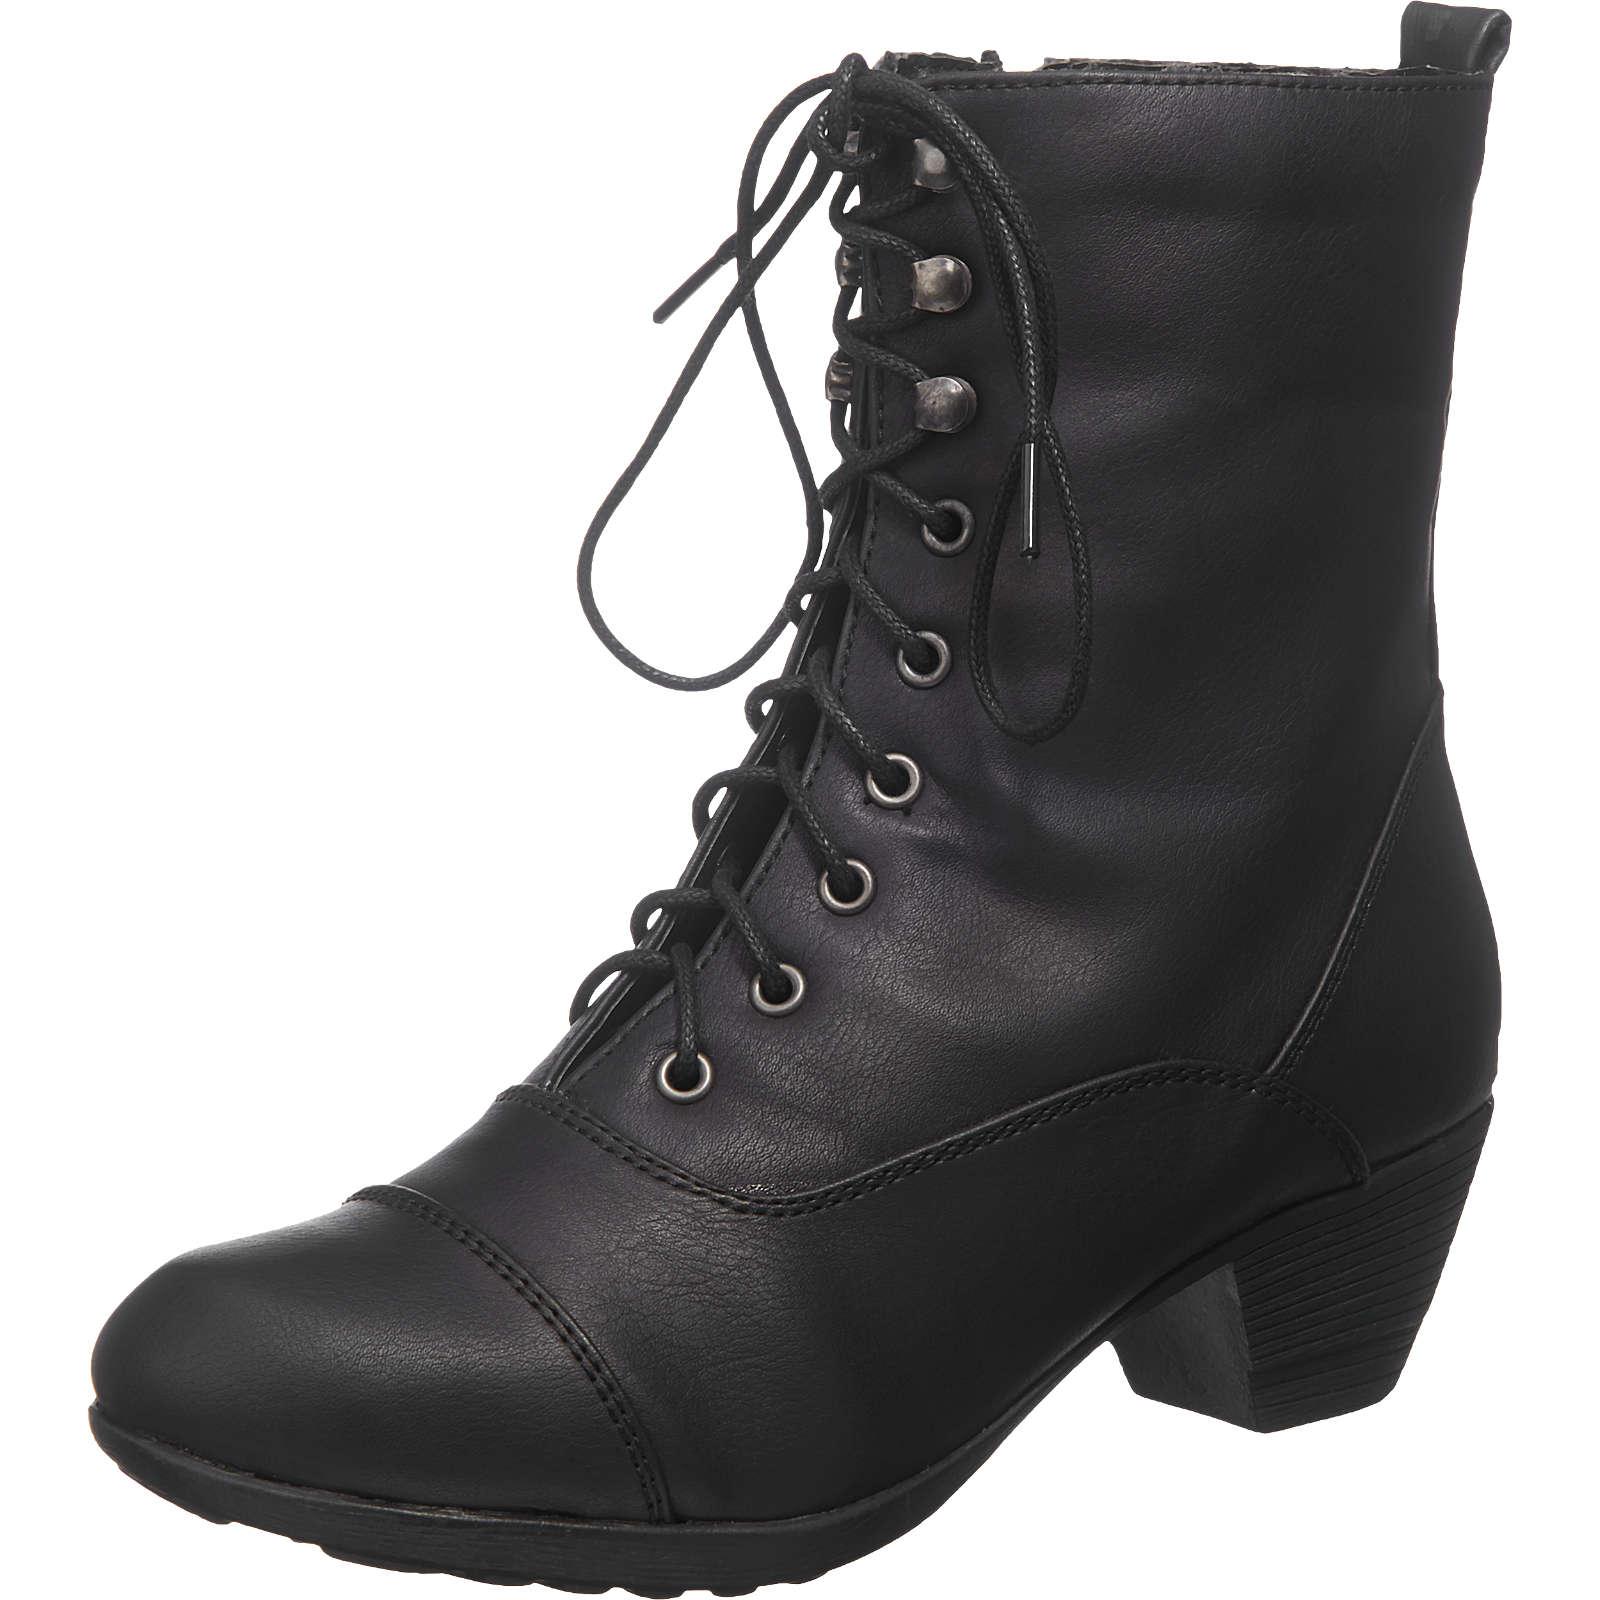 Andrea Conti Stiefeletten schwarz Damen Gr. 40 jetztbilligerkaufen